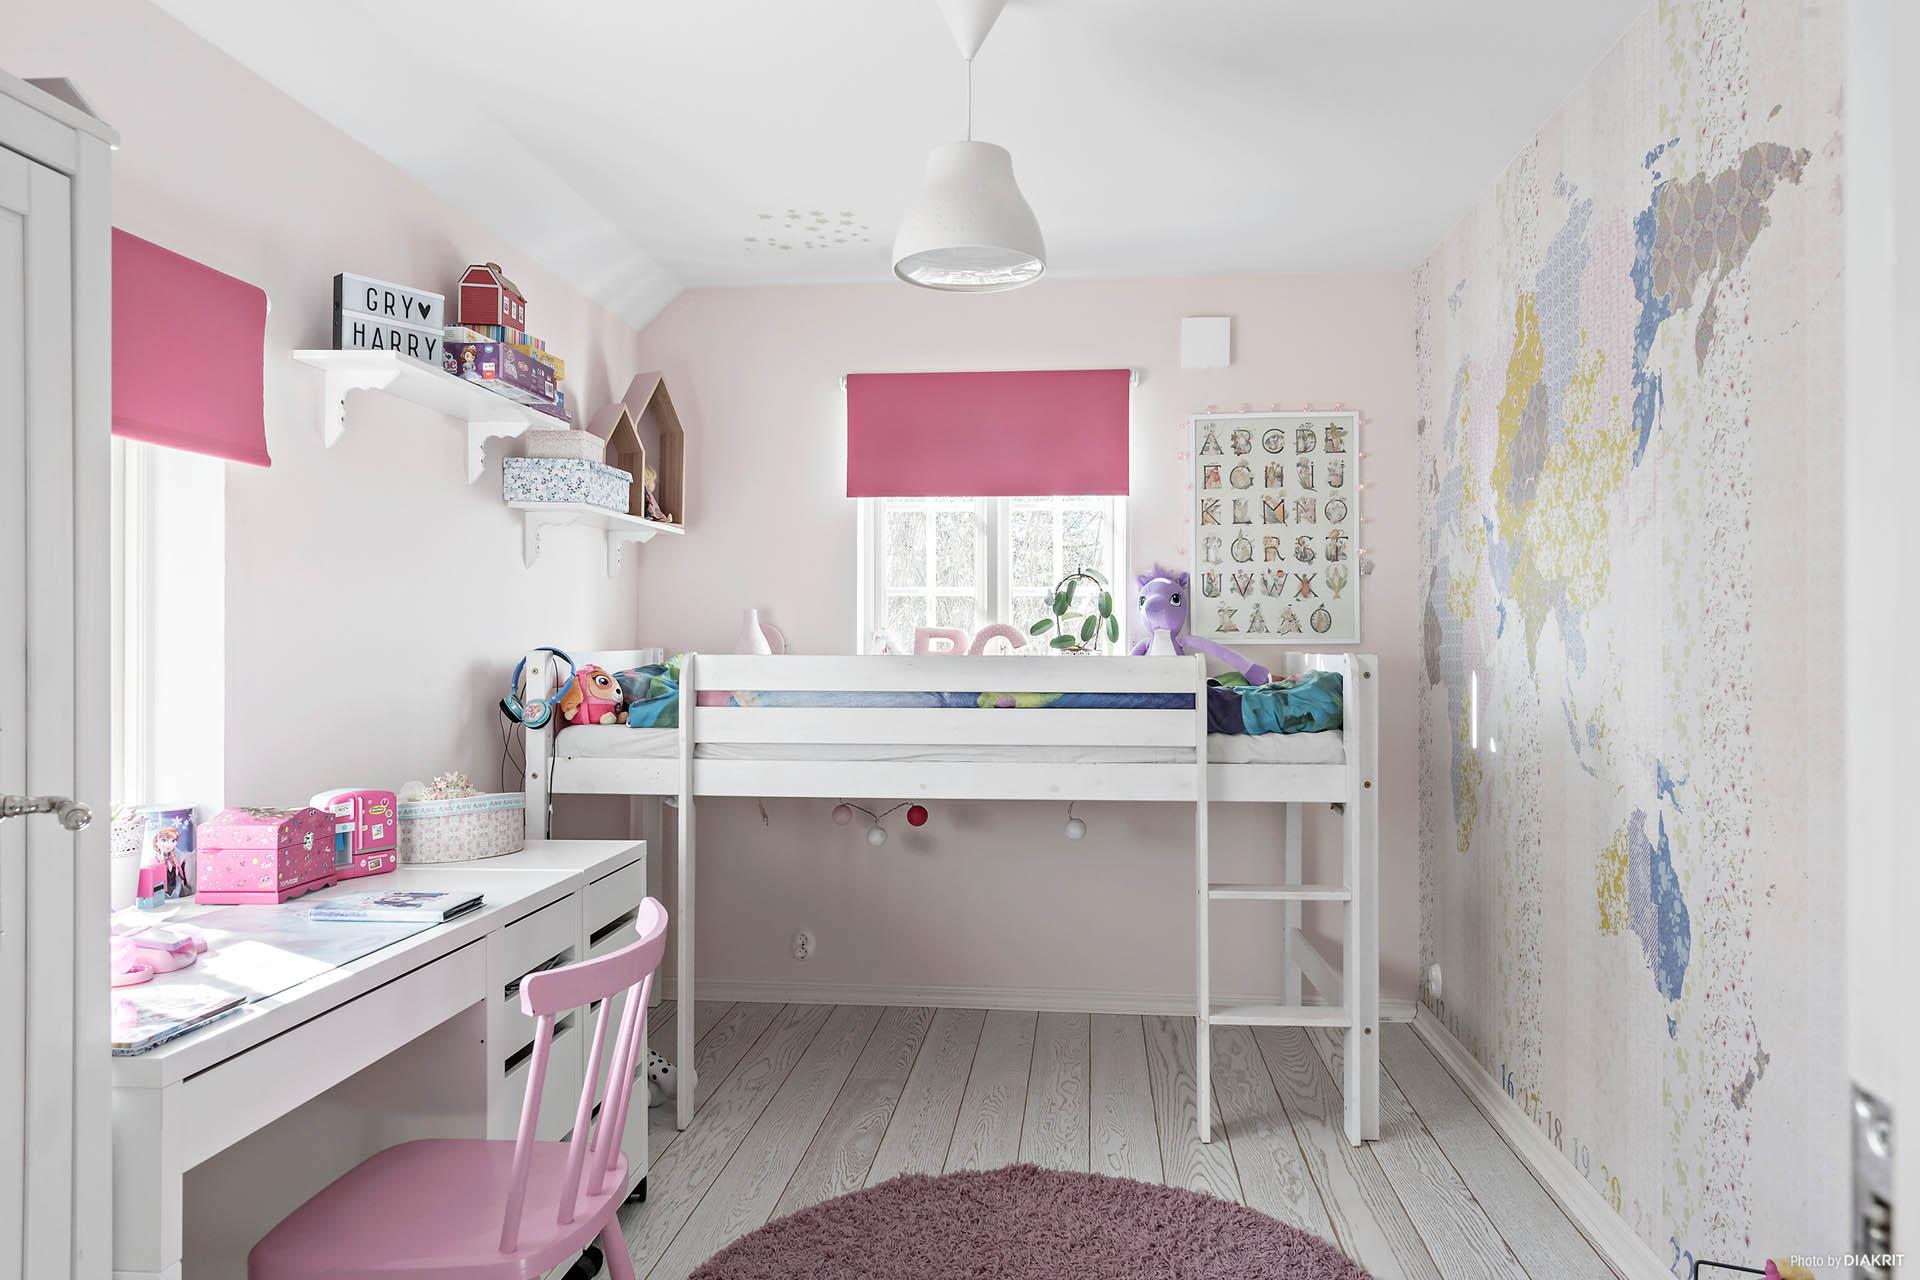 Sött sovrum i rosa toner.